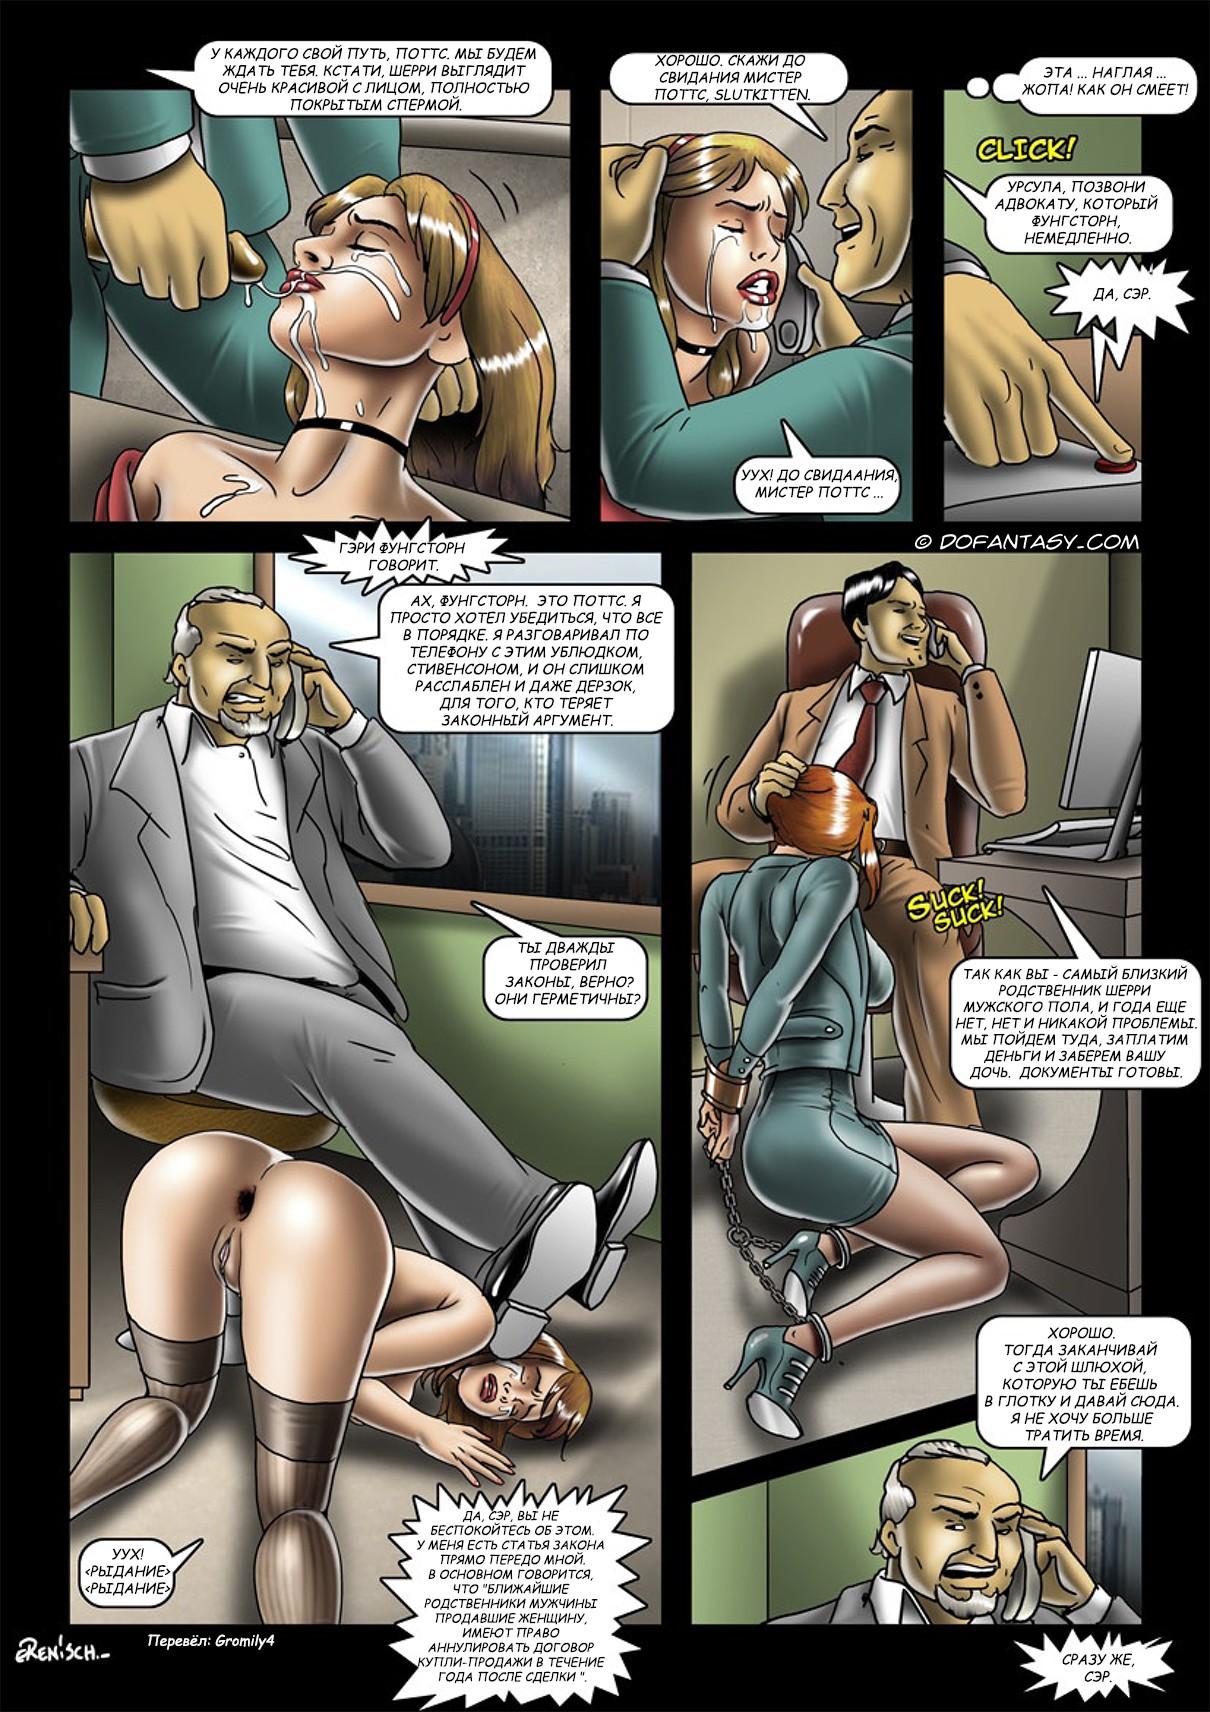 eroticheskie-istorii-parnyu